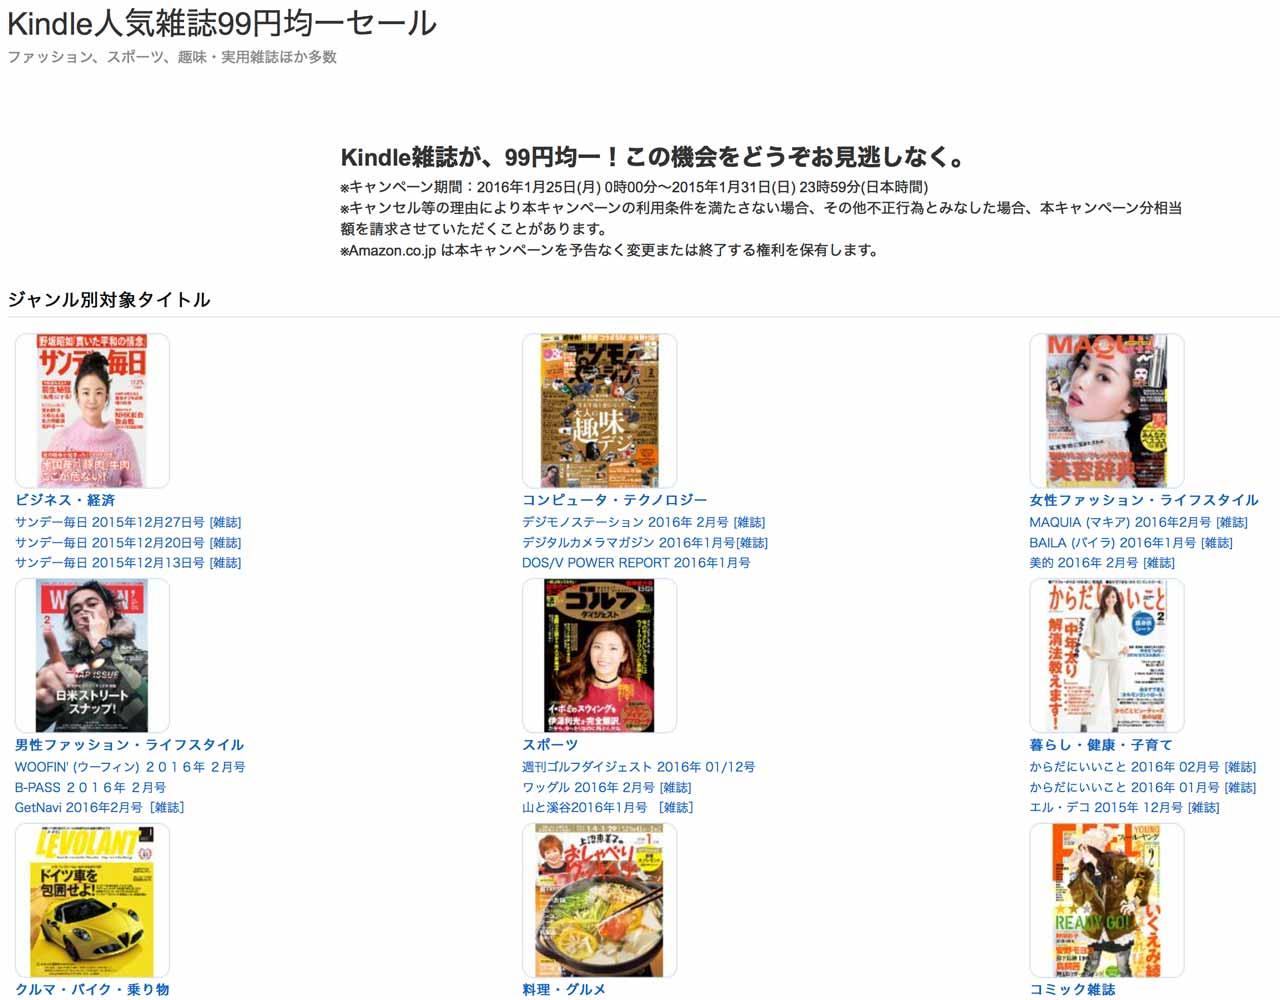 Kindleストア、1,779冊が対象の「Kindle人気雑誌99円均一セール」実施中